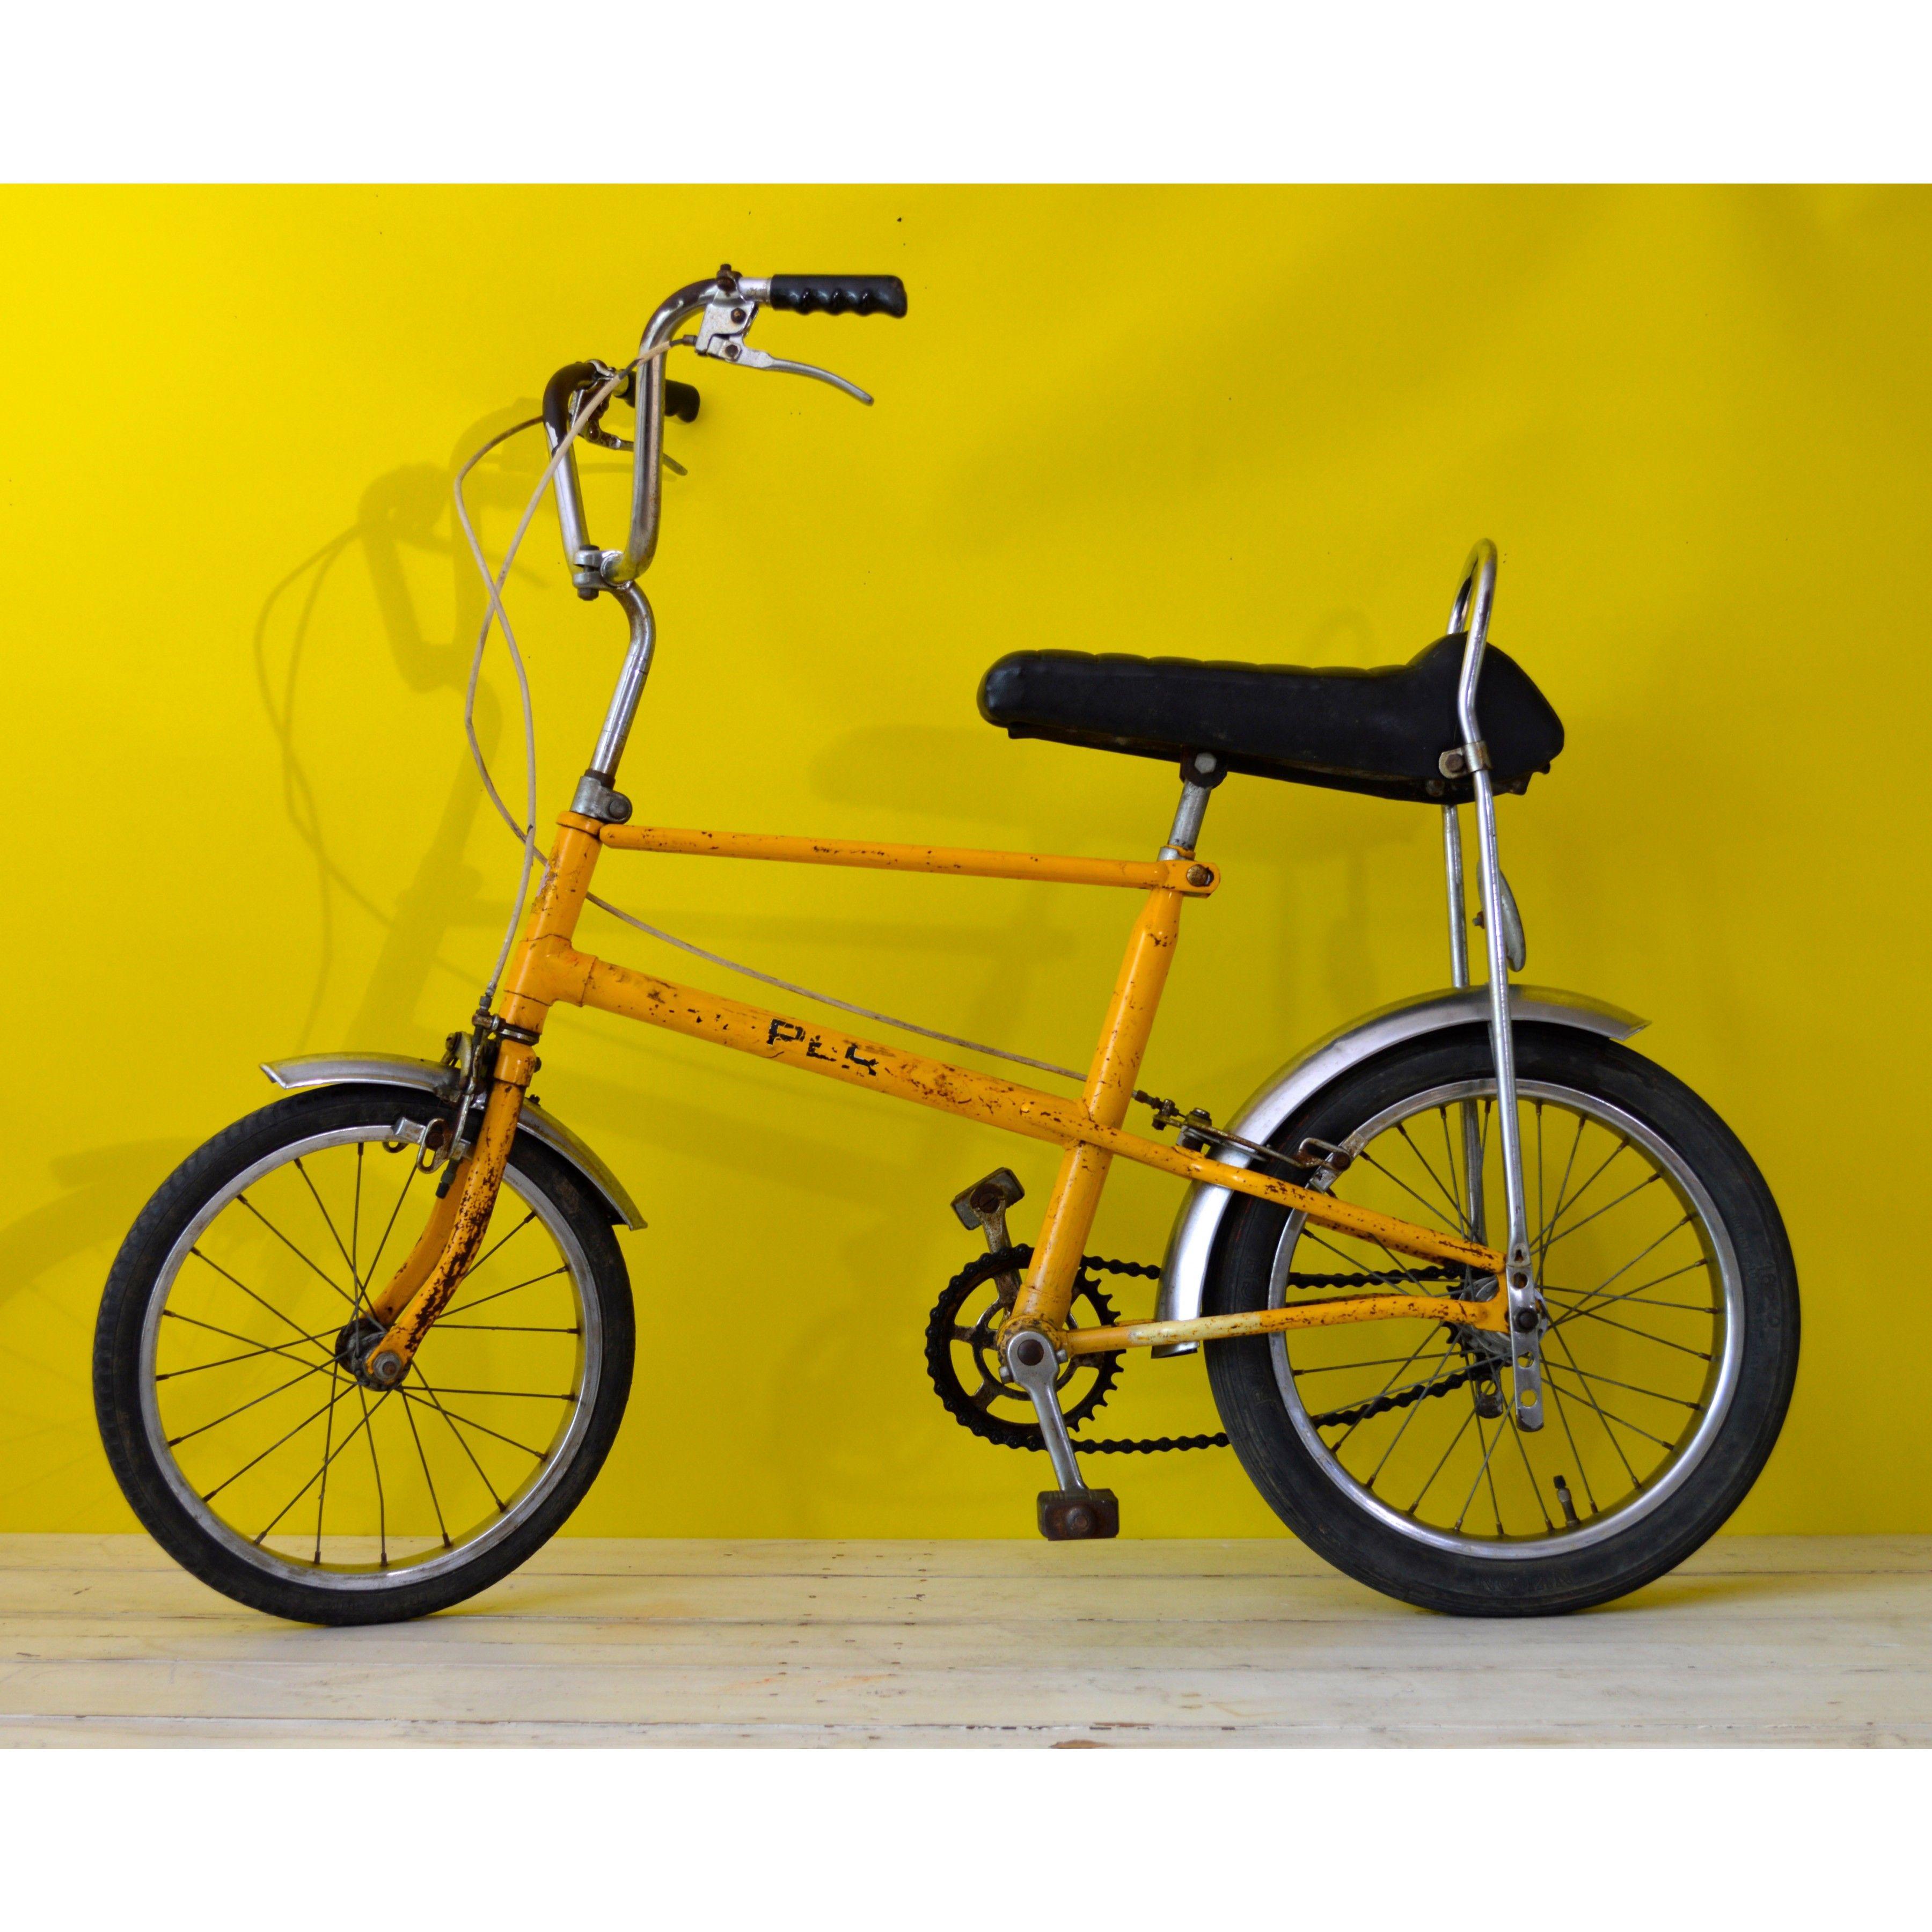 raleigh chipper bike rale8gh bikes raleigh bikes bike. Black Bedroom Furniture Sets. Home Design Ideas